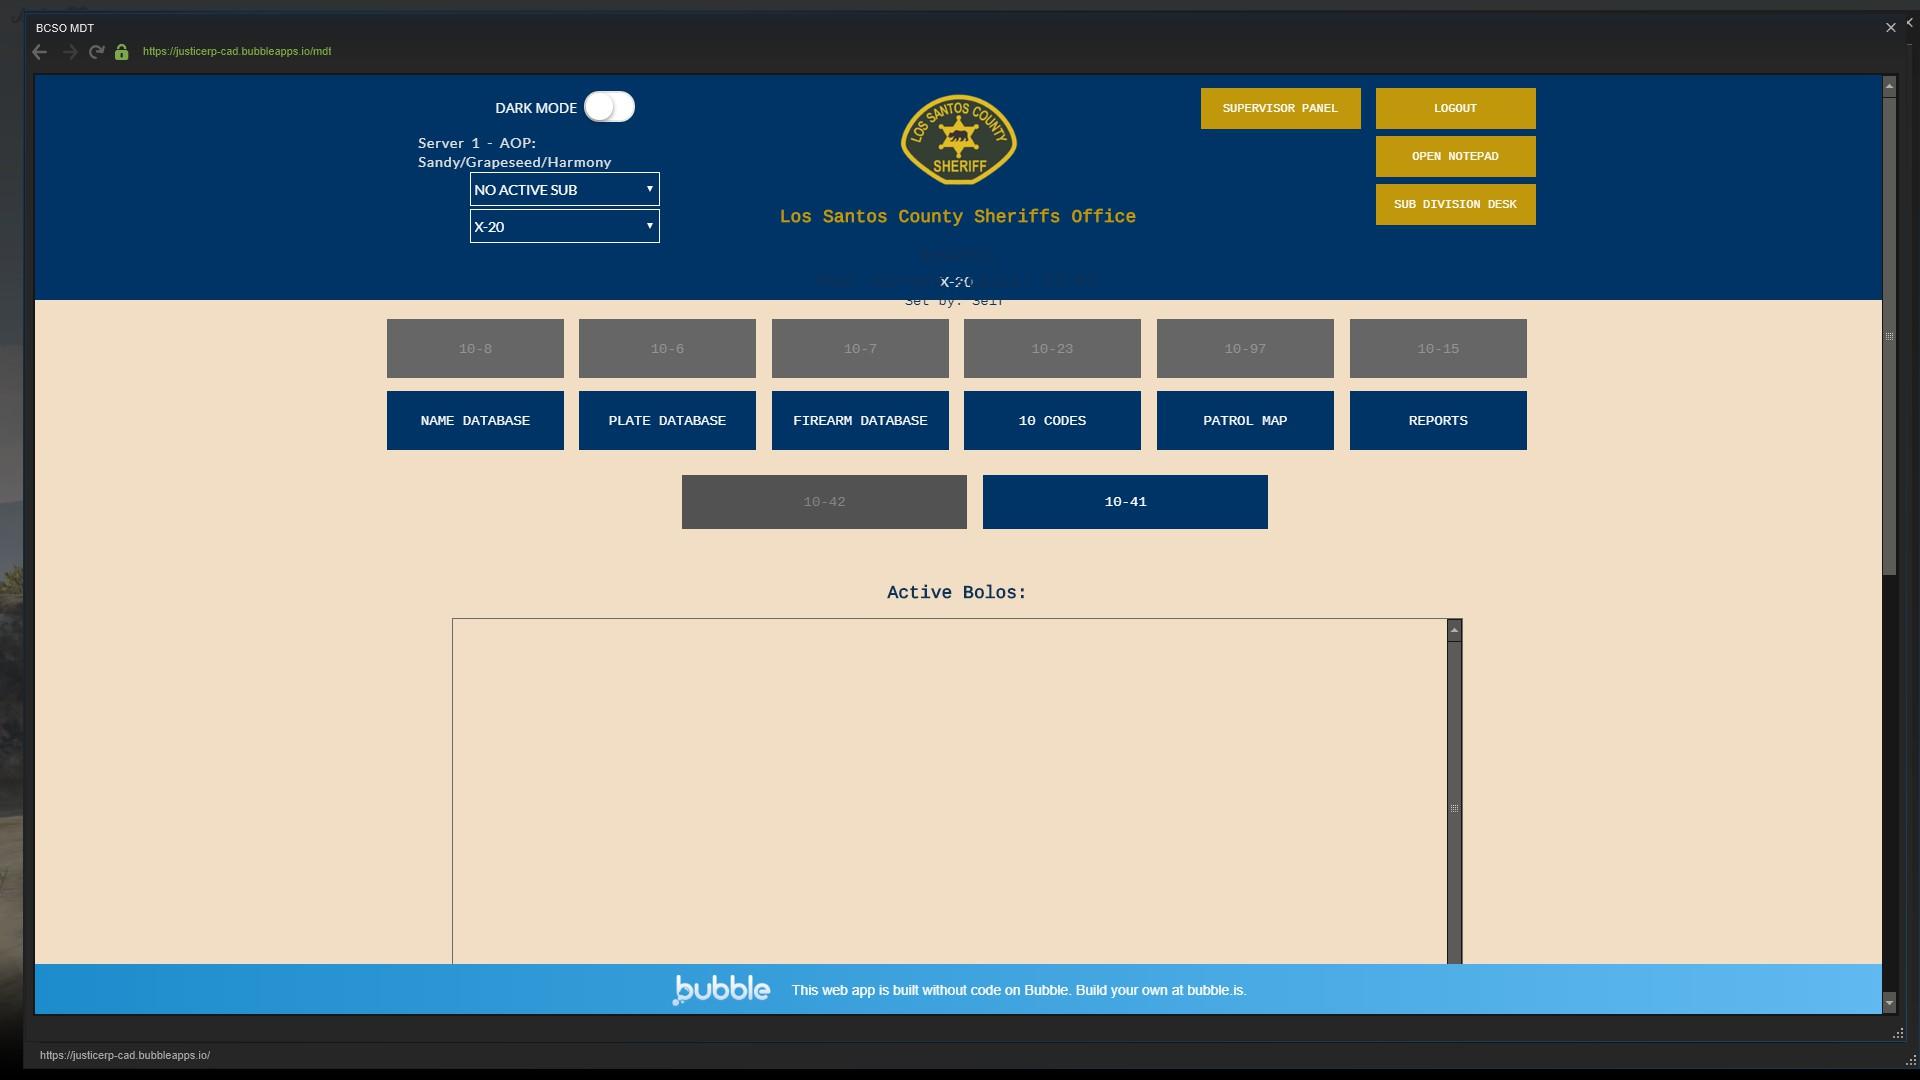 Higher Ranks Needed* JusticeRP | Recruiting Admins| Like DOJ